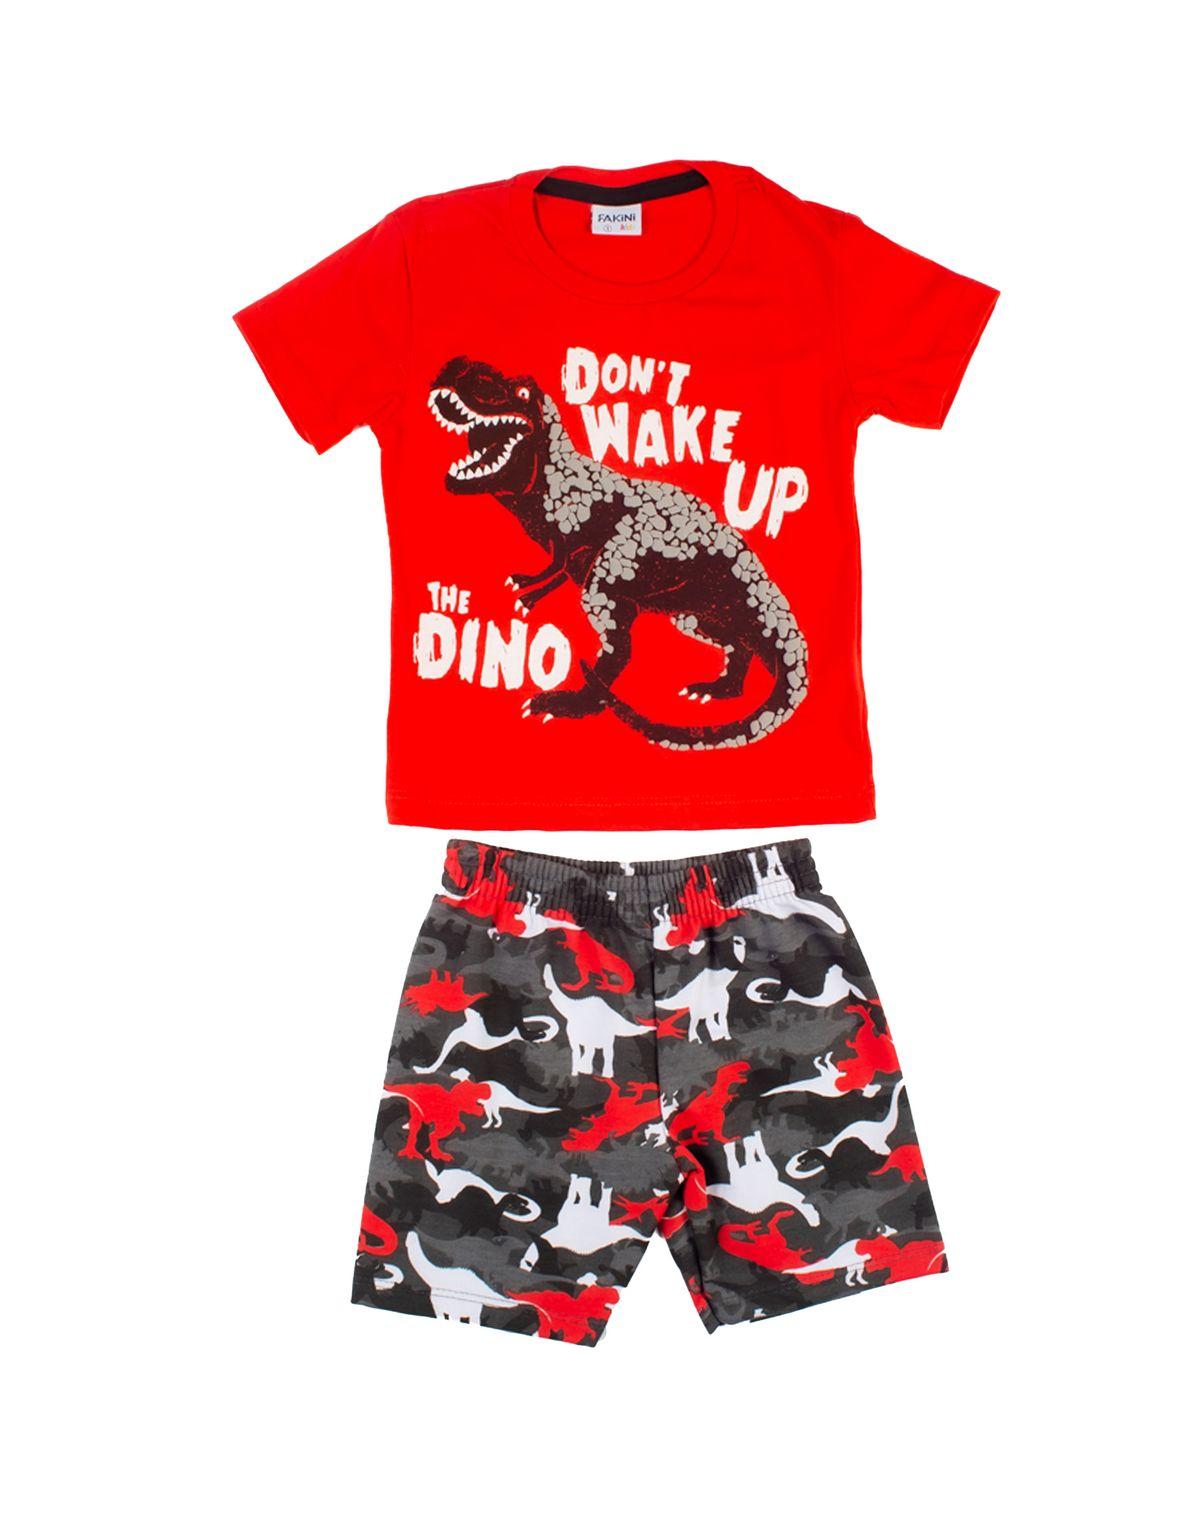 565930006-conjunto-curto-bebe-menino-estampa-alto-relevo-dinossauro-vermelho-3-712